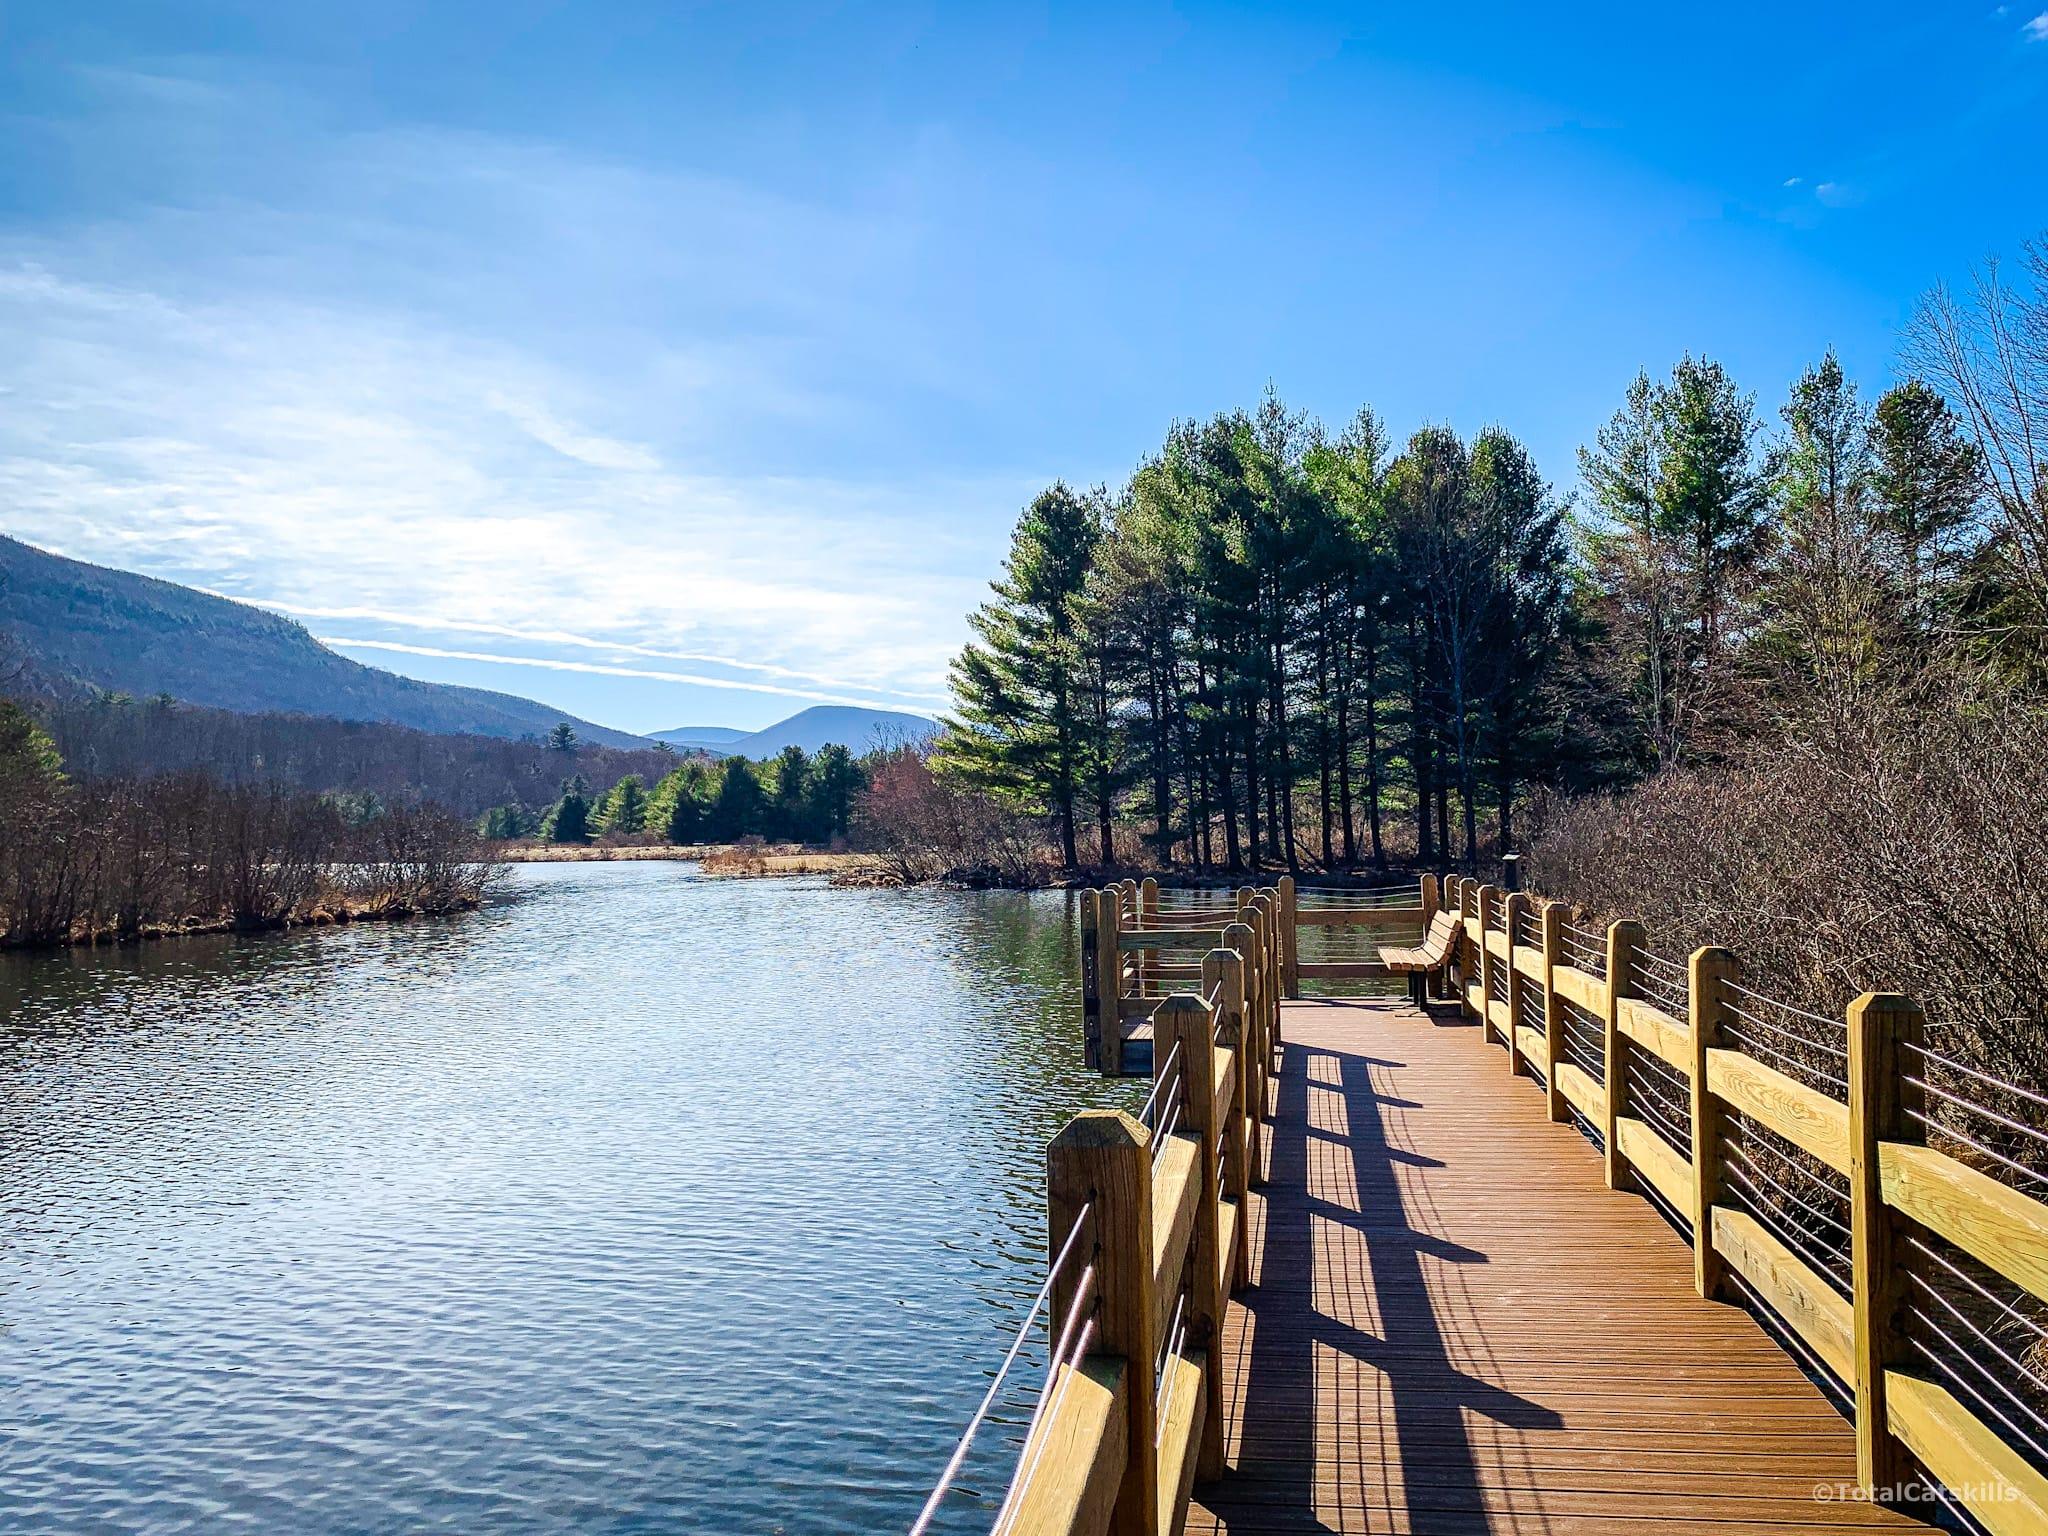 fishing dock, pond, mountains, trees, catskills